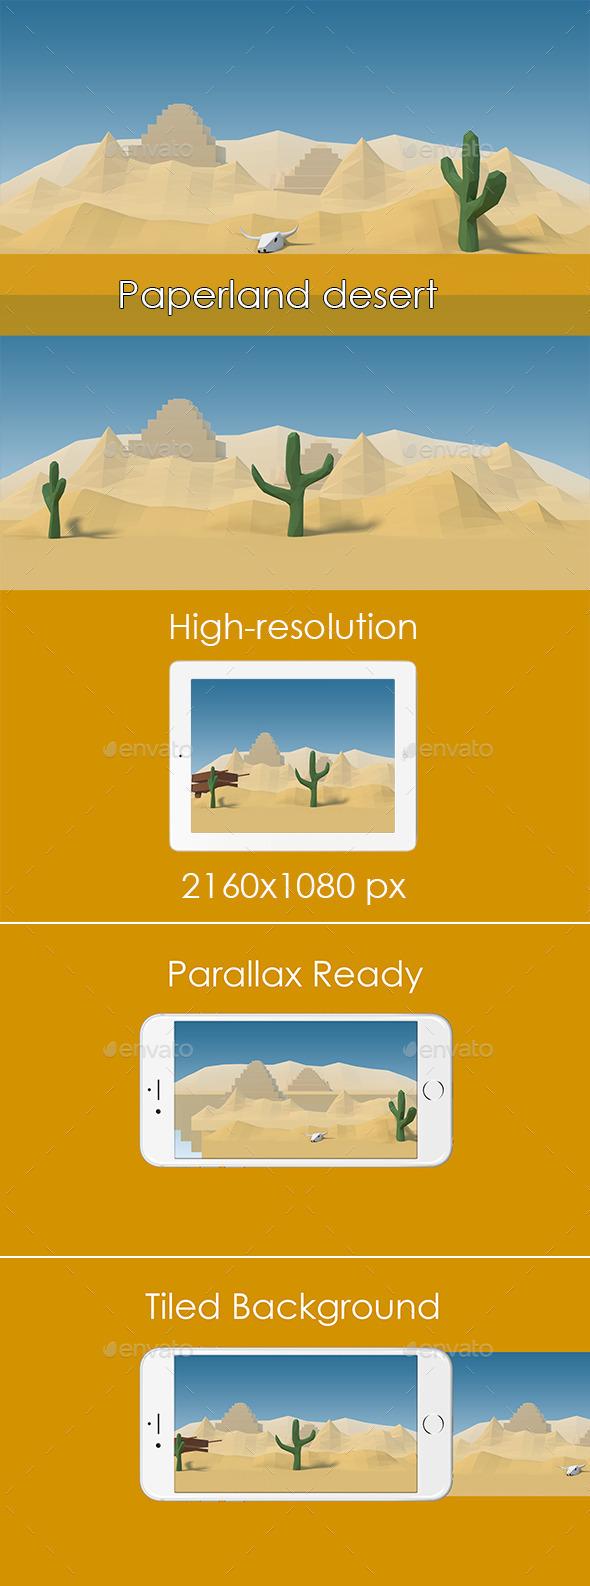 Paperland Desert Game Background - Backgrounds Game Assets